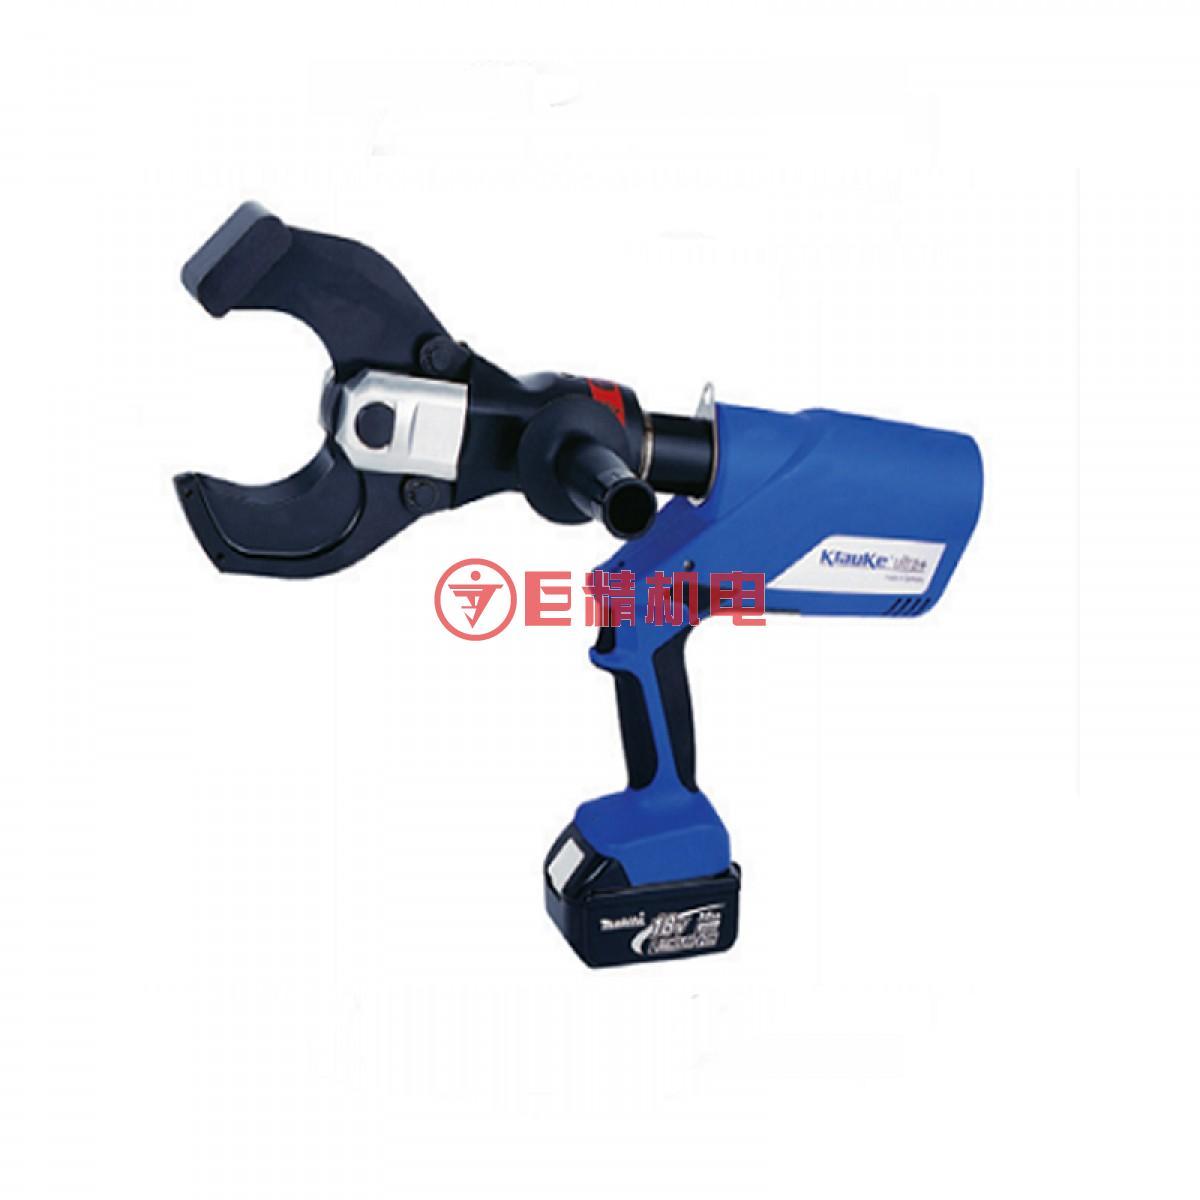 KLAUKE 充电式液压软质切刀 ESG85L